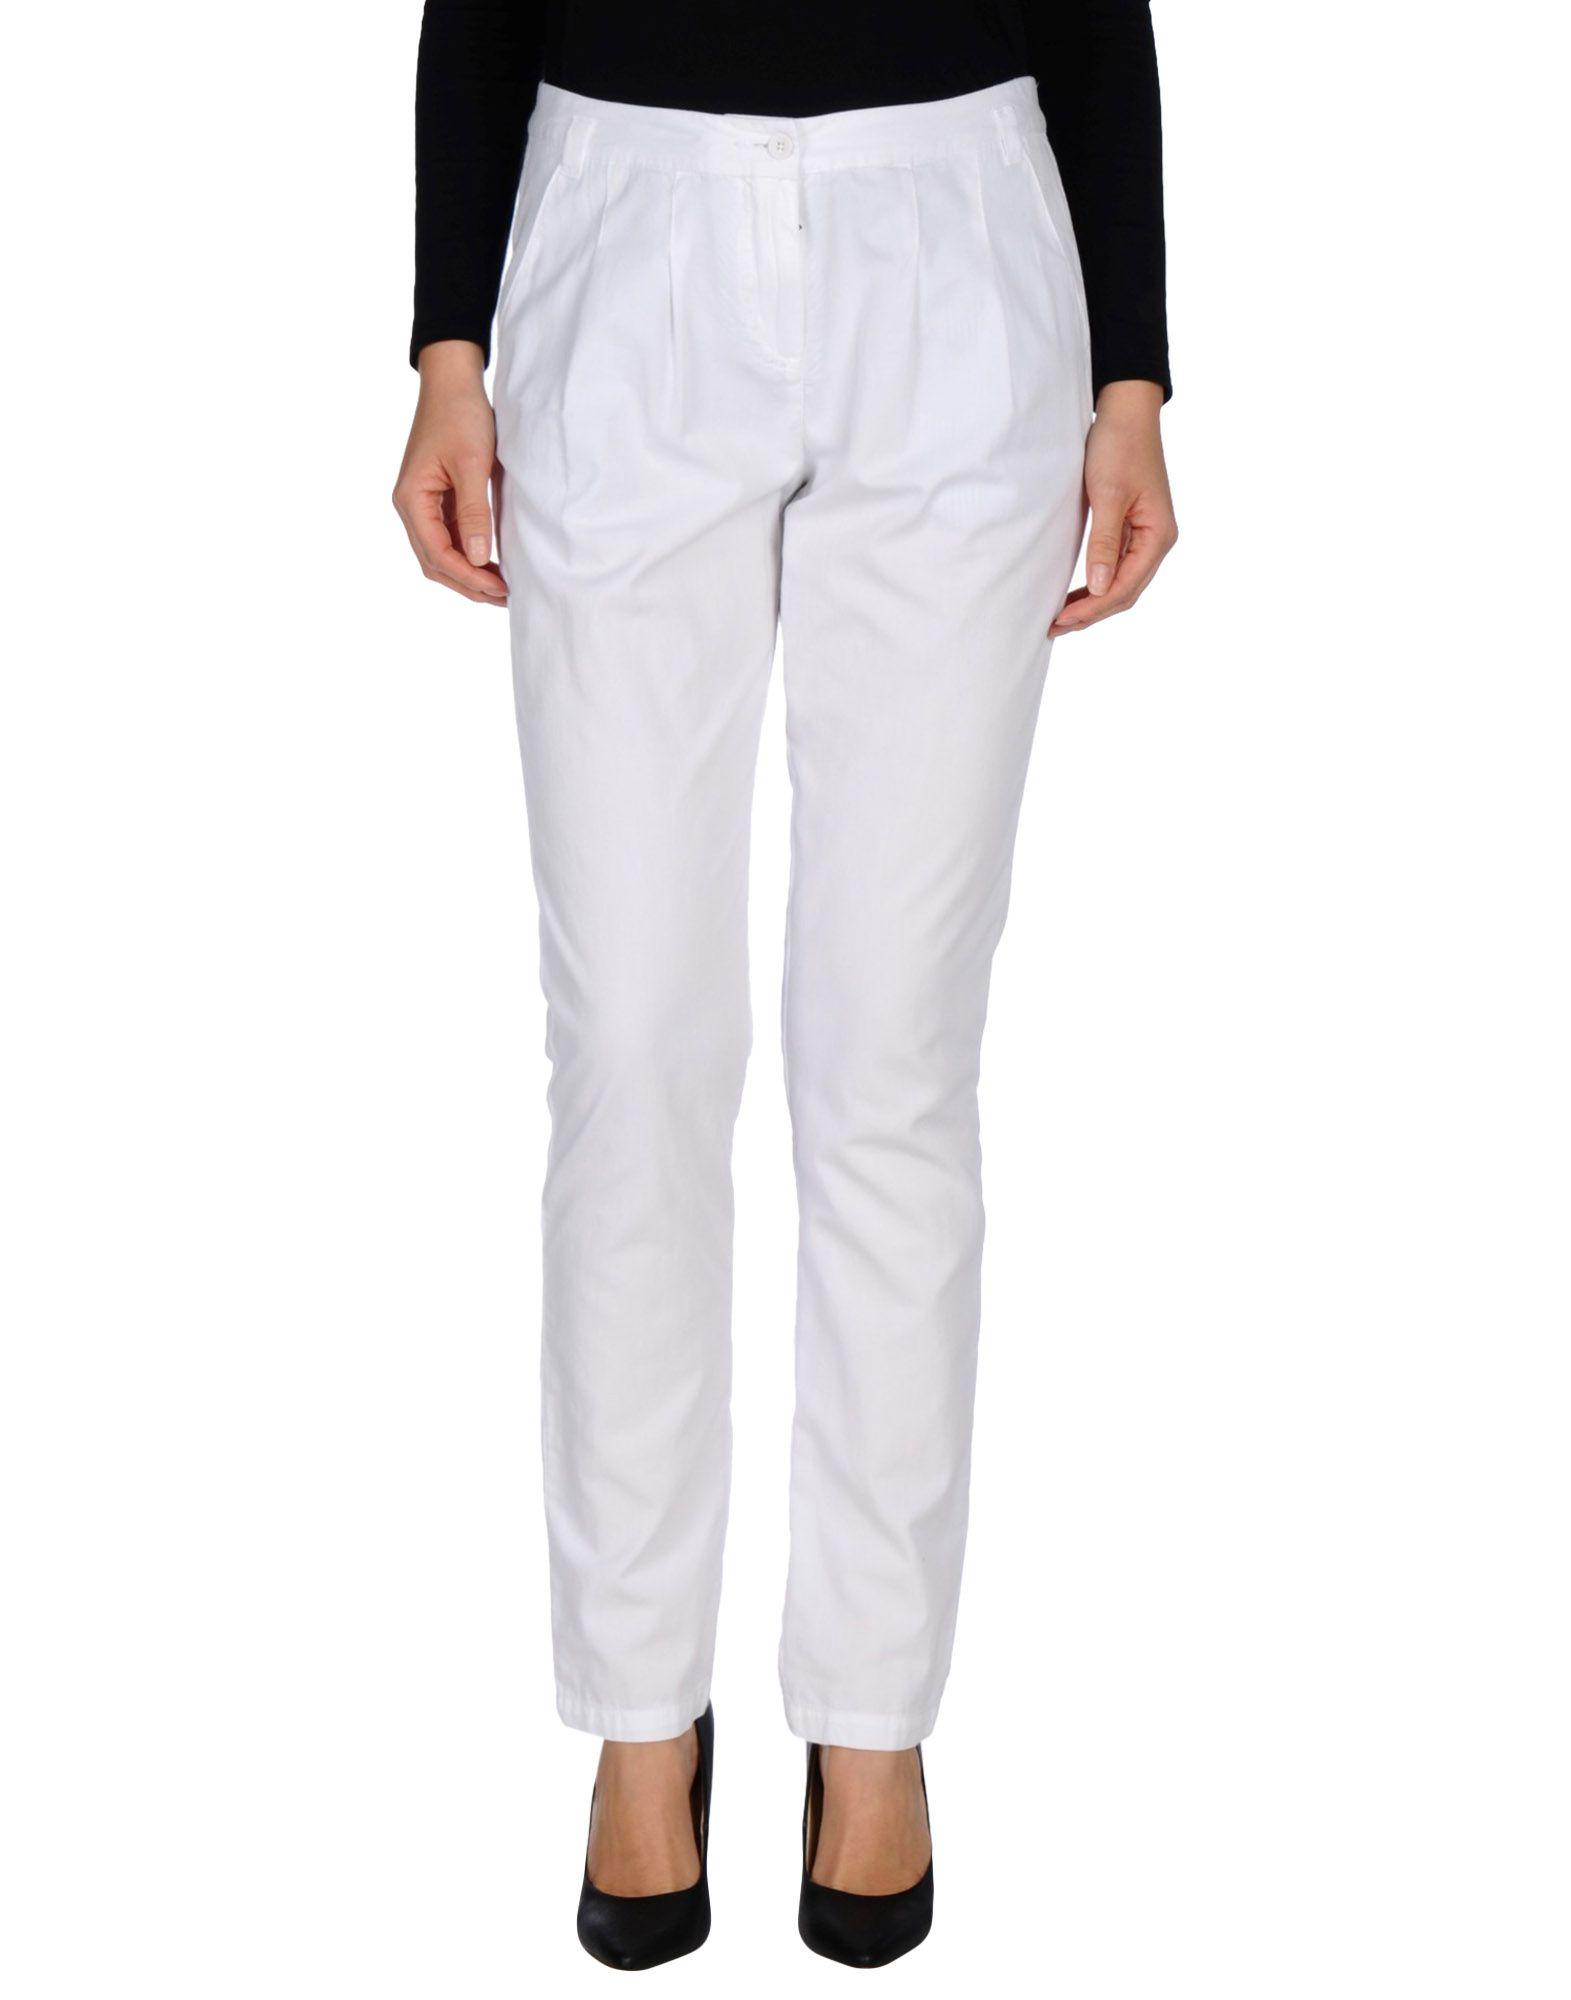 ONLY 4 STYLISH GIRLS by PATRIZIA PEPE Повседневные брюки цена 2017